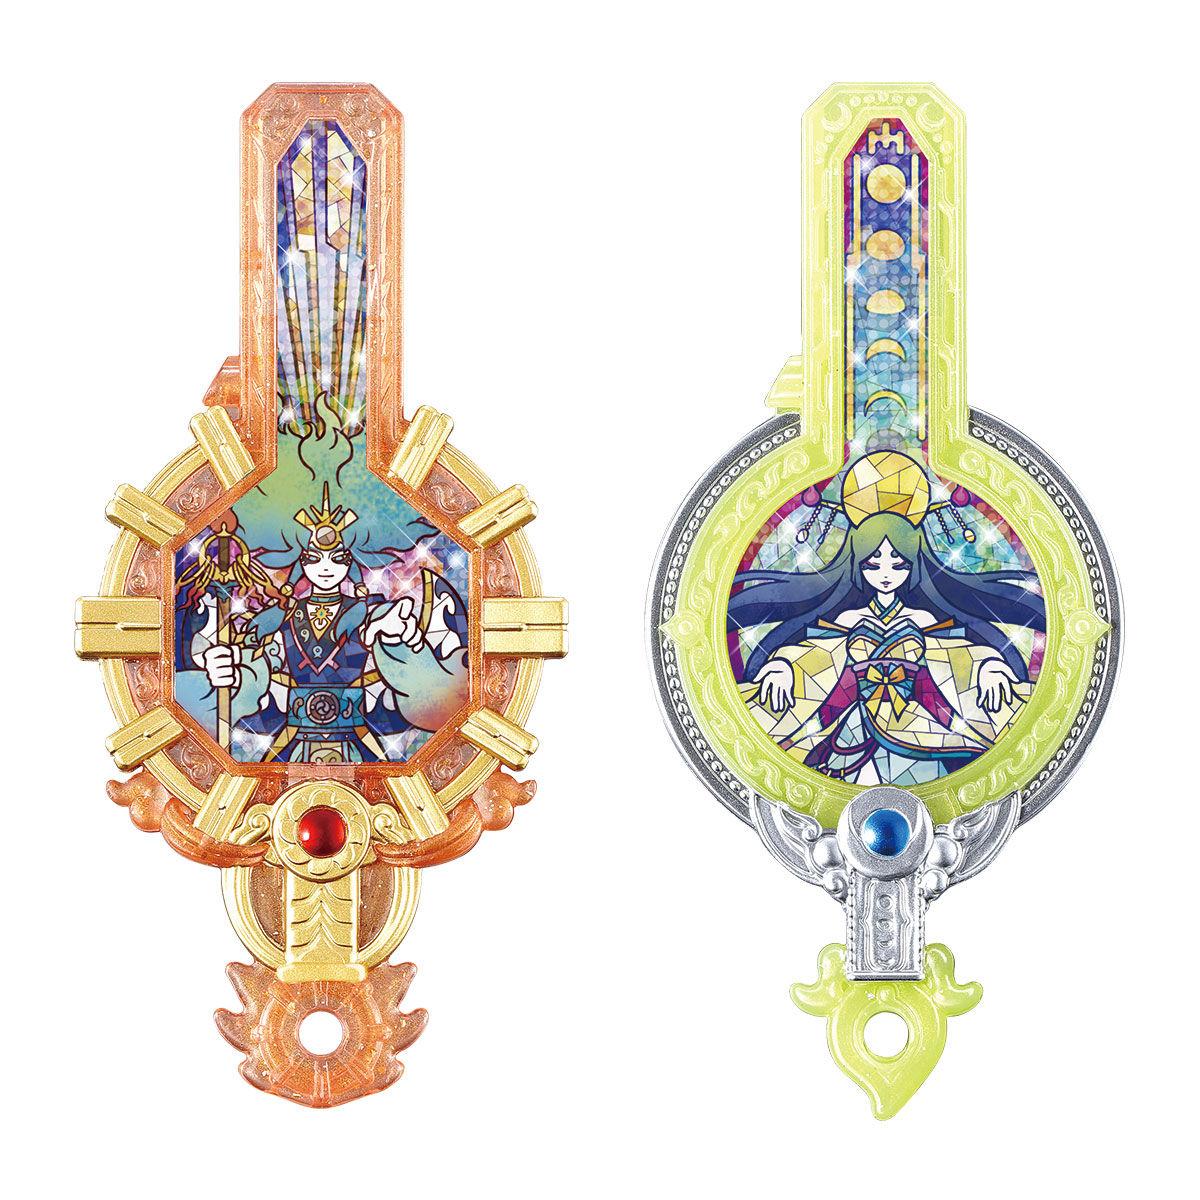 DX妖怪アークシリーズ05 賢神アマテラス&月神ツクヨミ